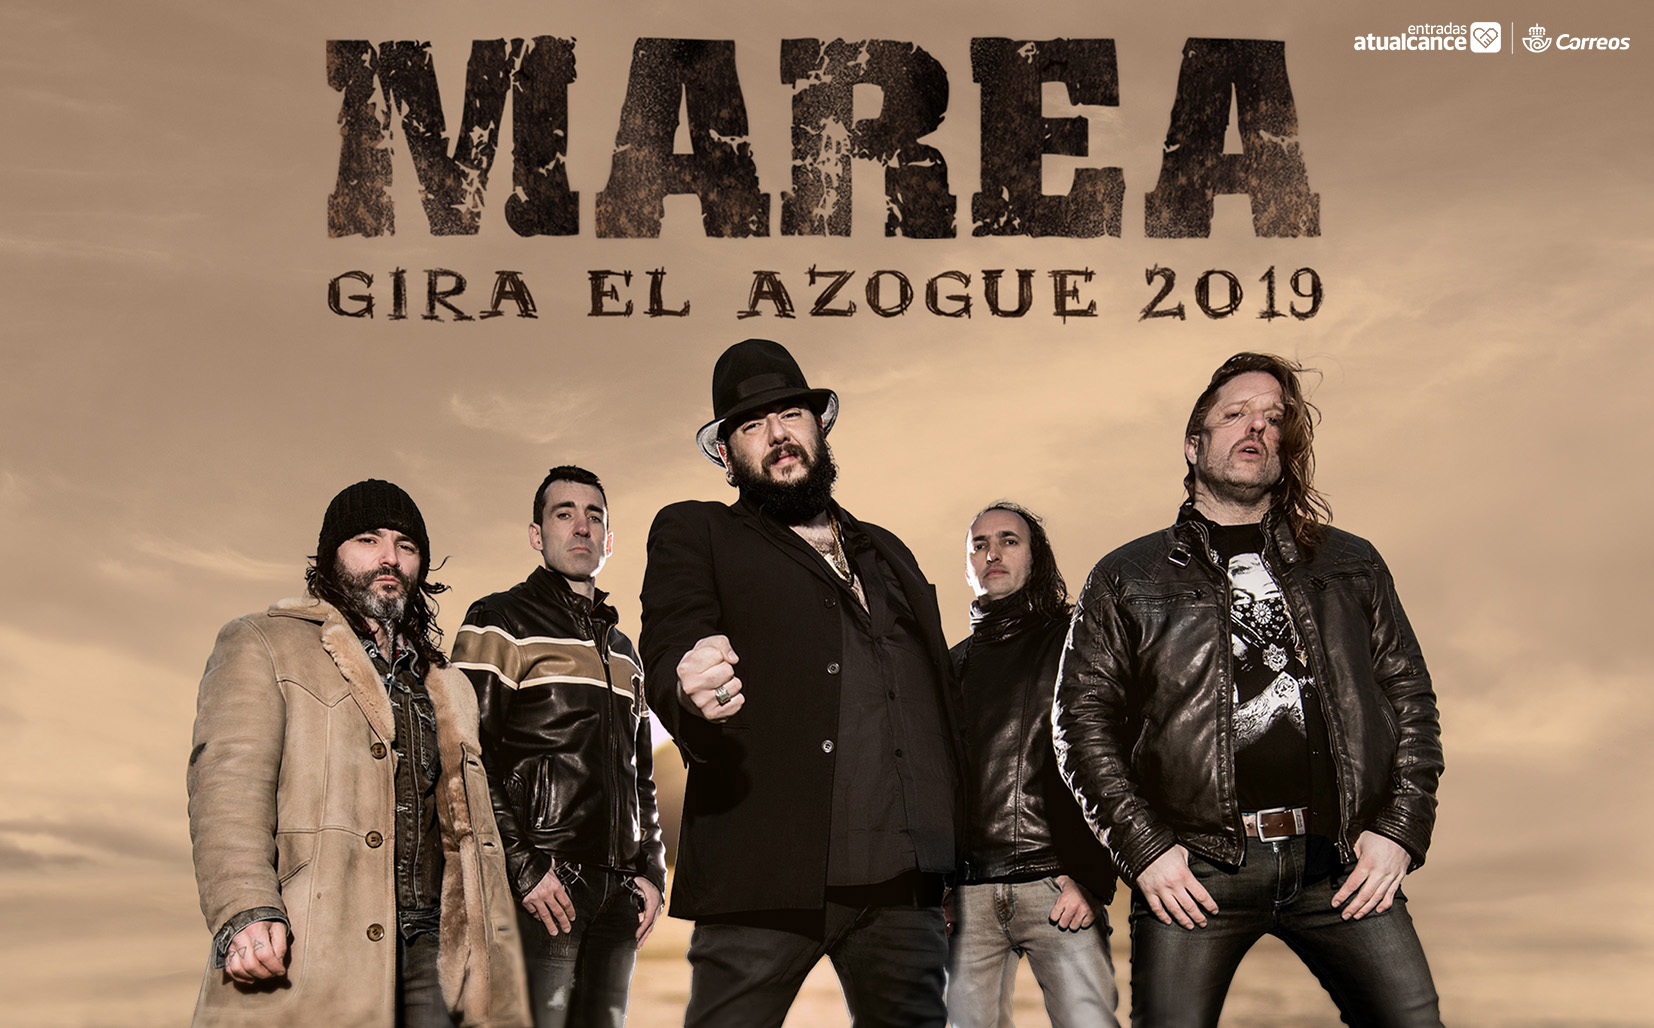 marea-gira-el-azogue-2019-en-sevilla-5c8